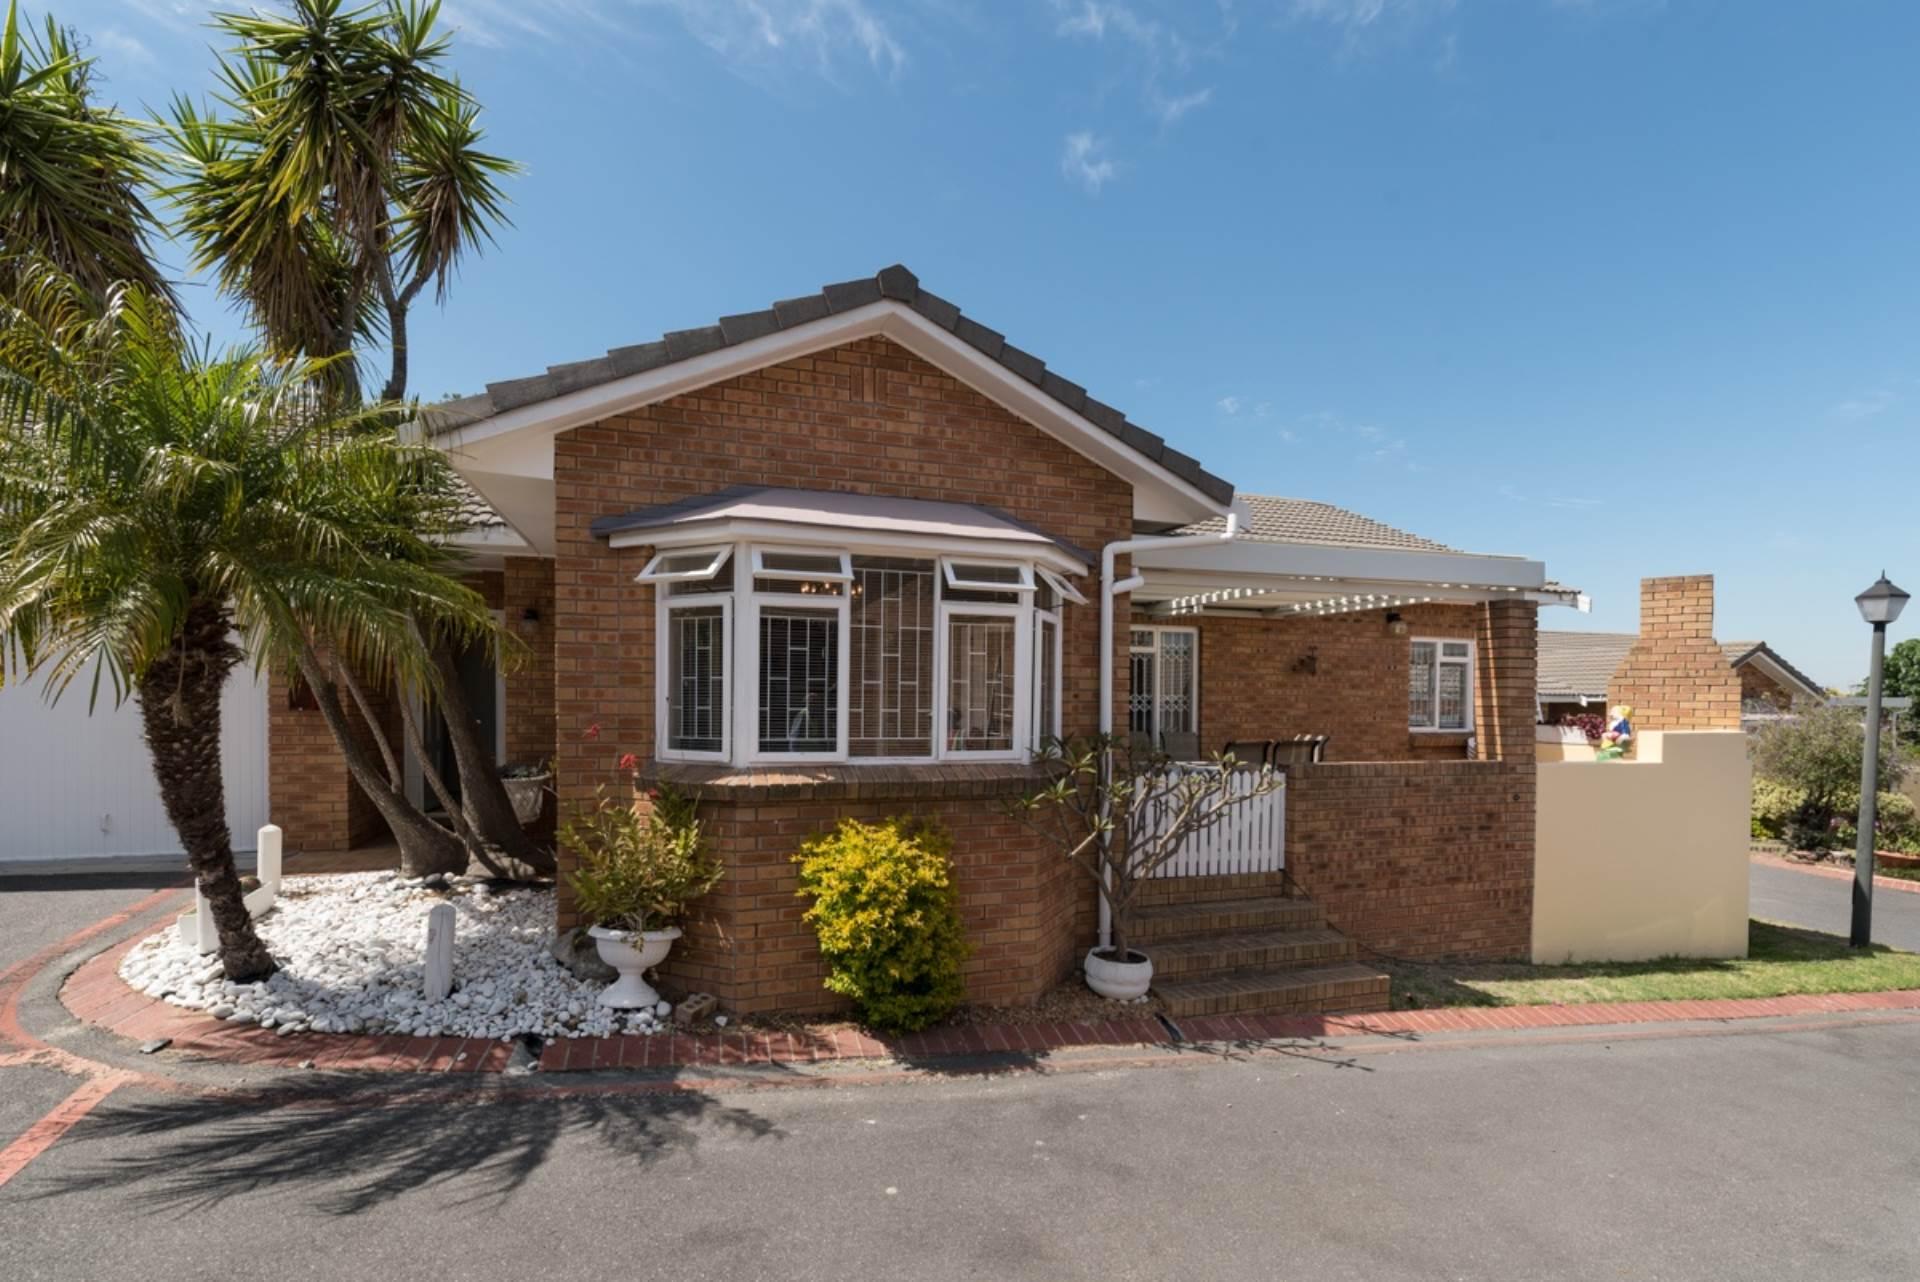 2 BedroomHouse For Sale In Kenridge